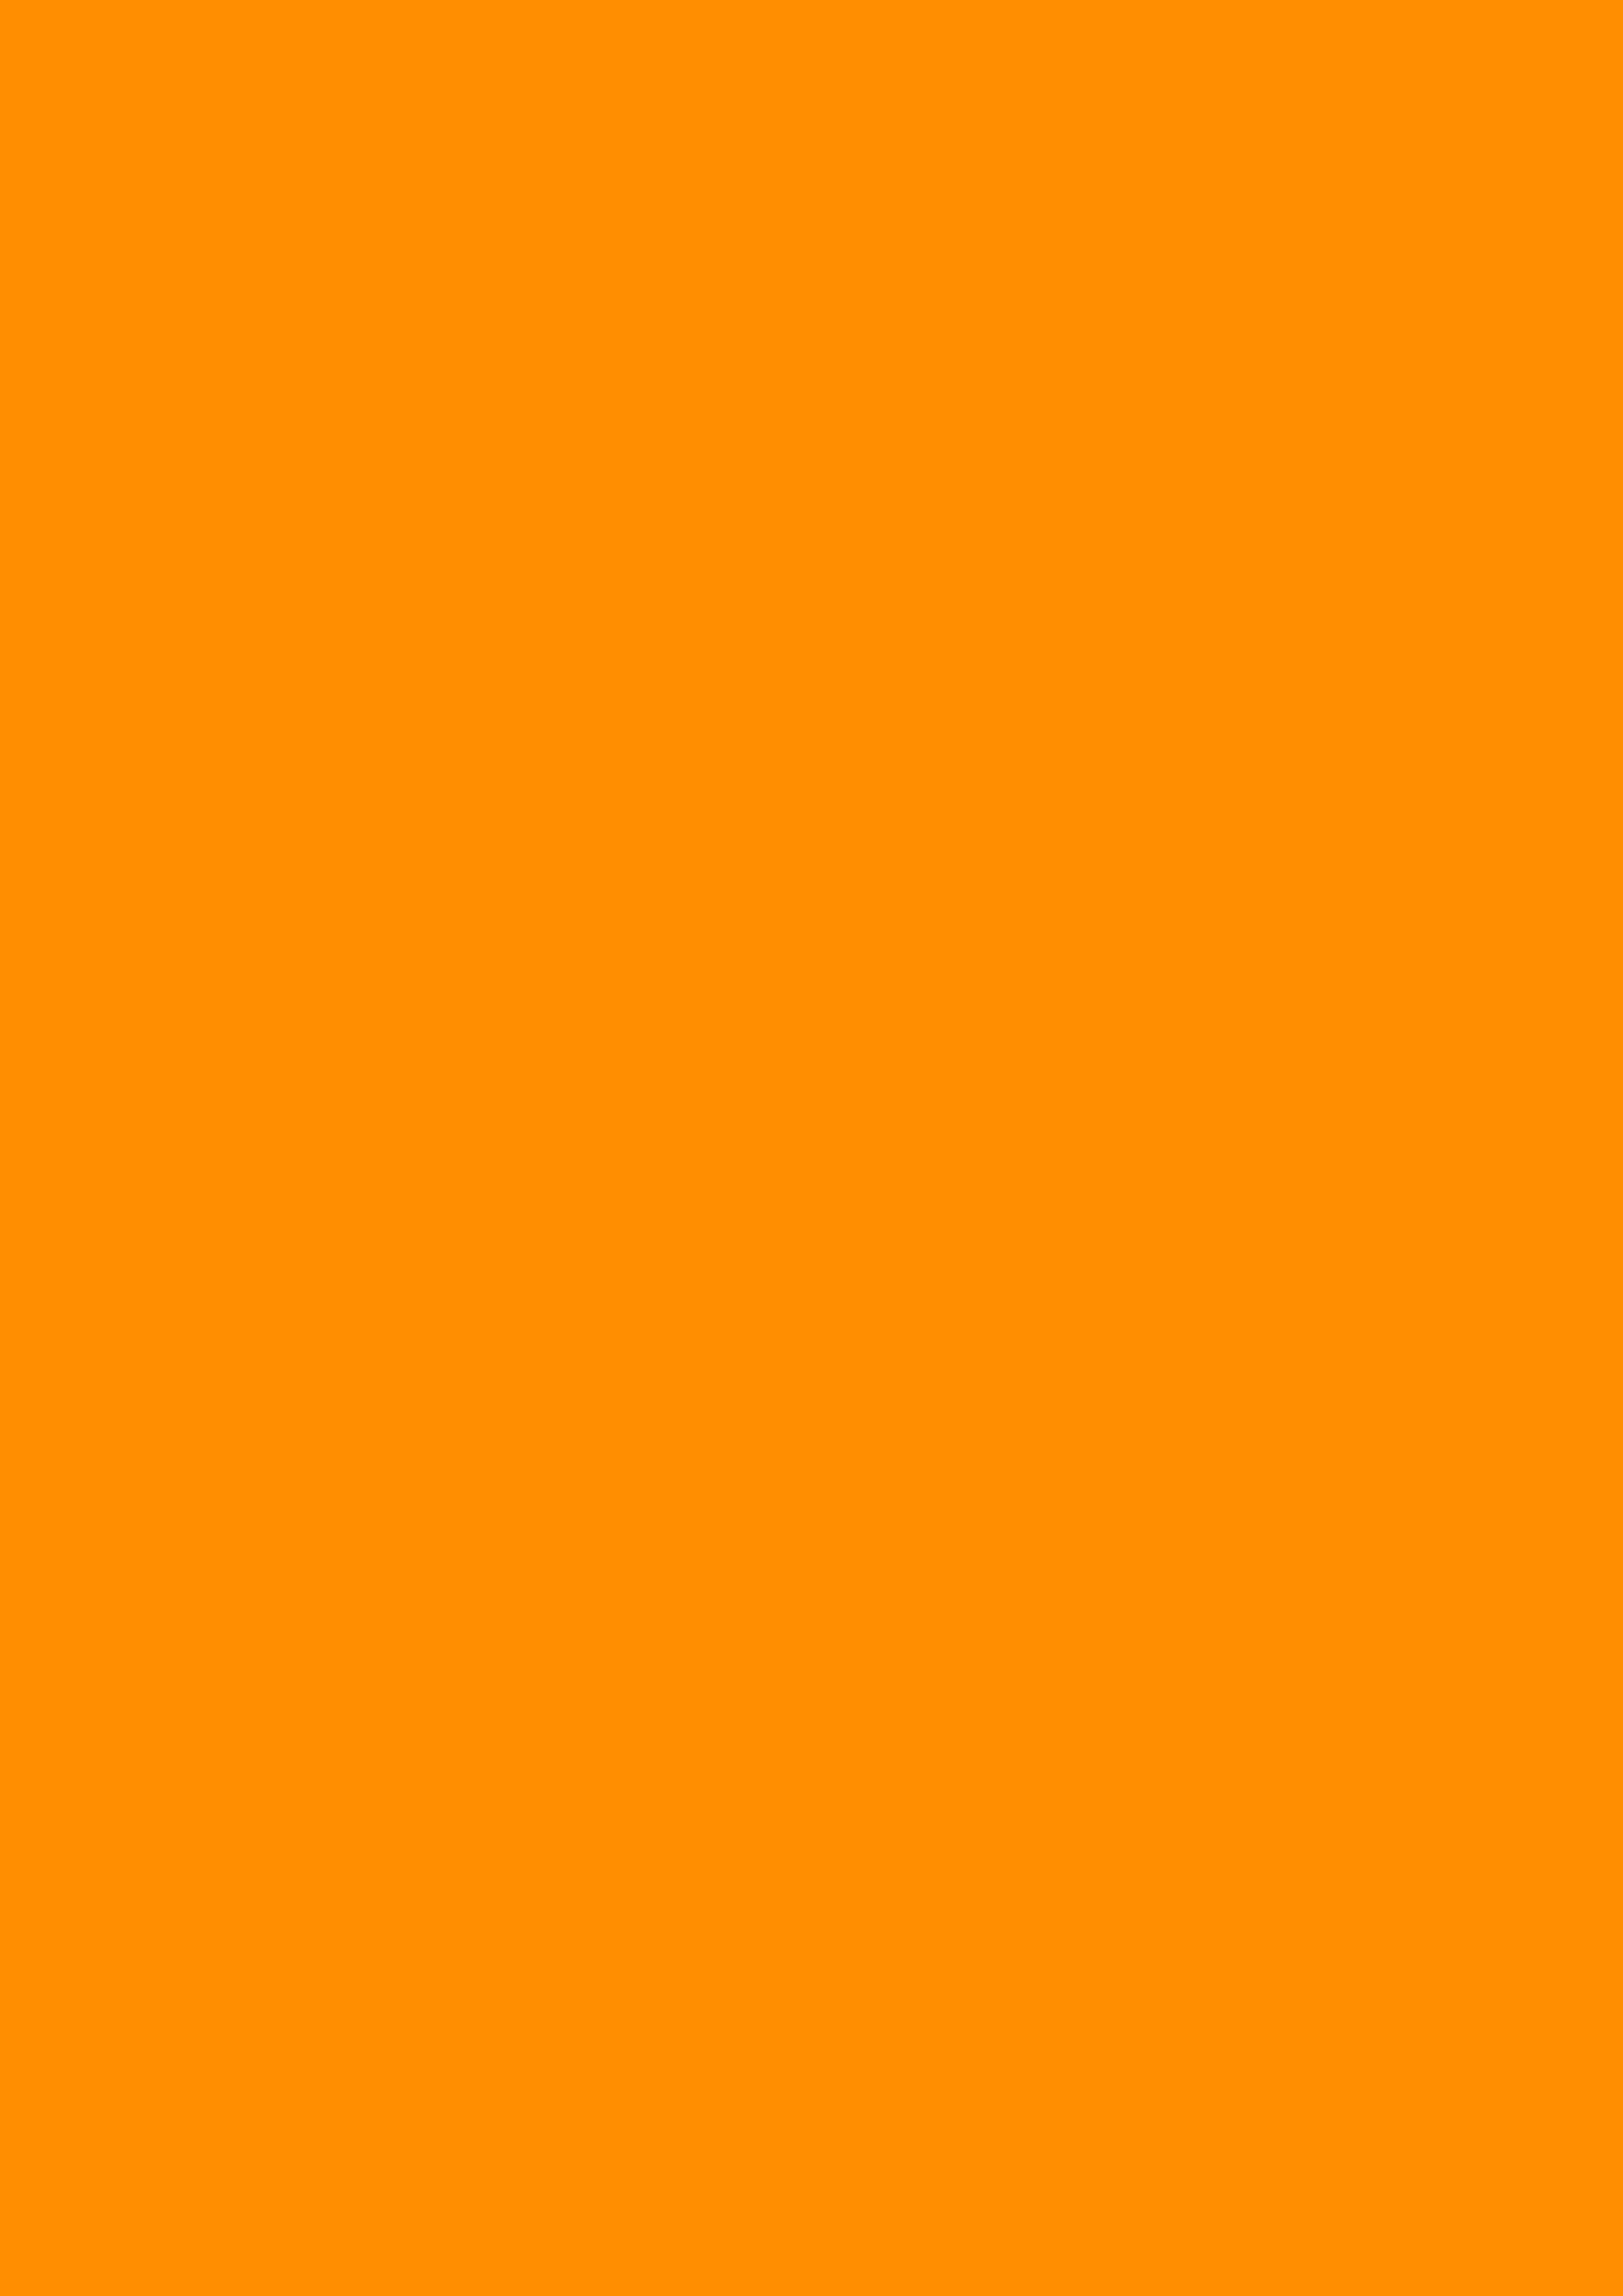 2480x3508 Princeton Orange Solid Color Background